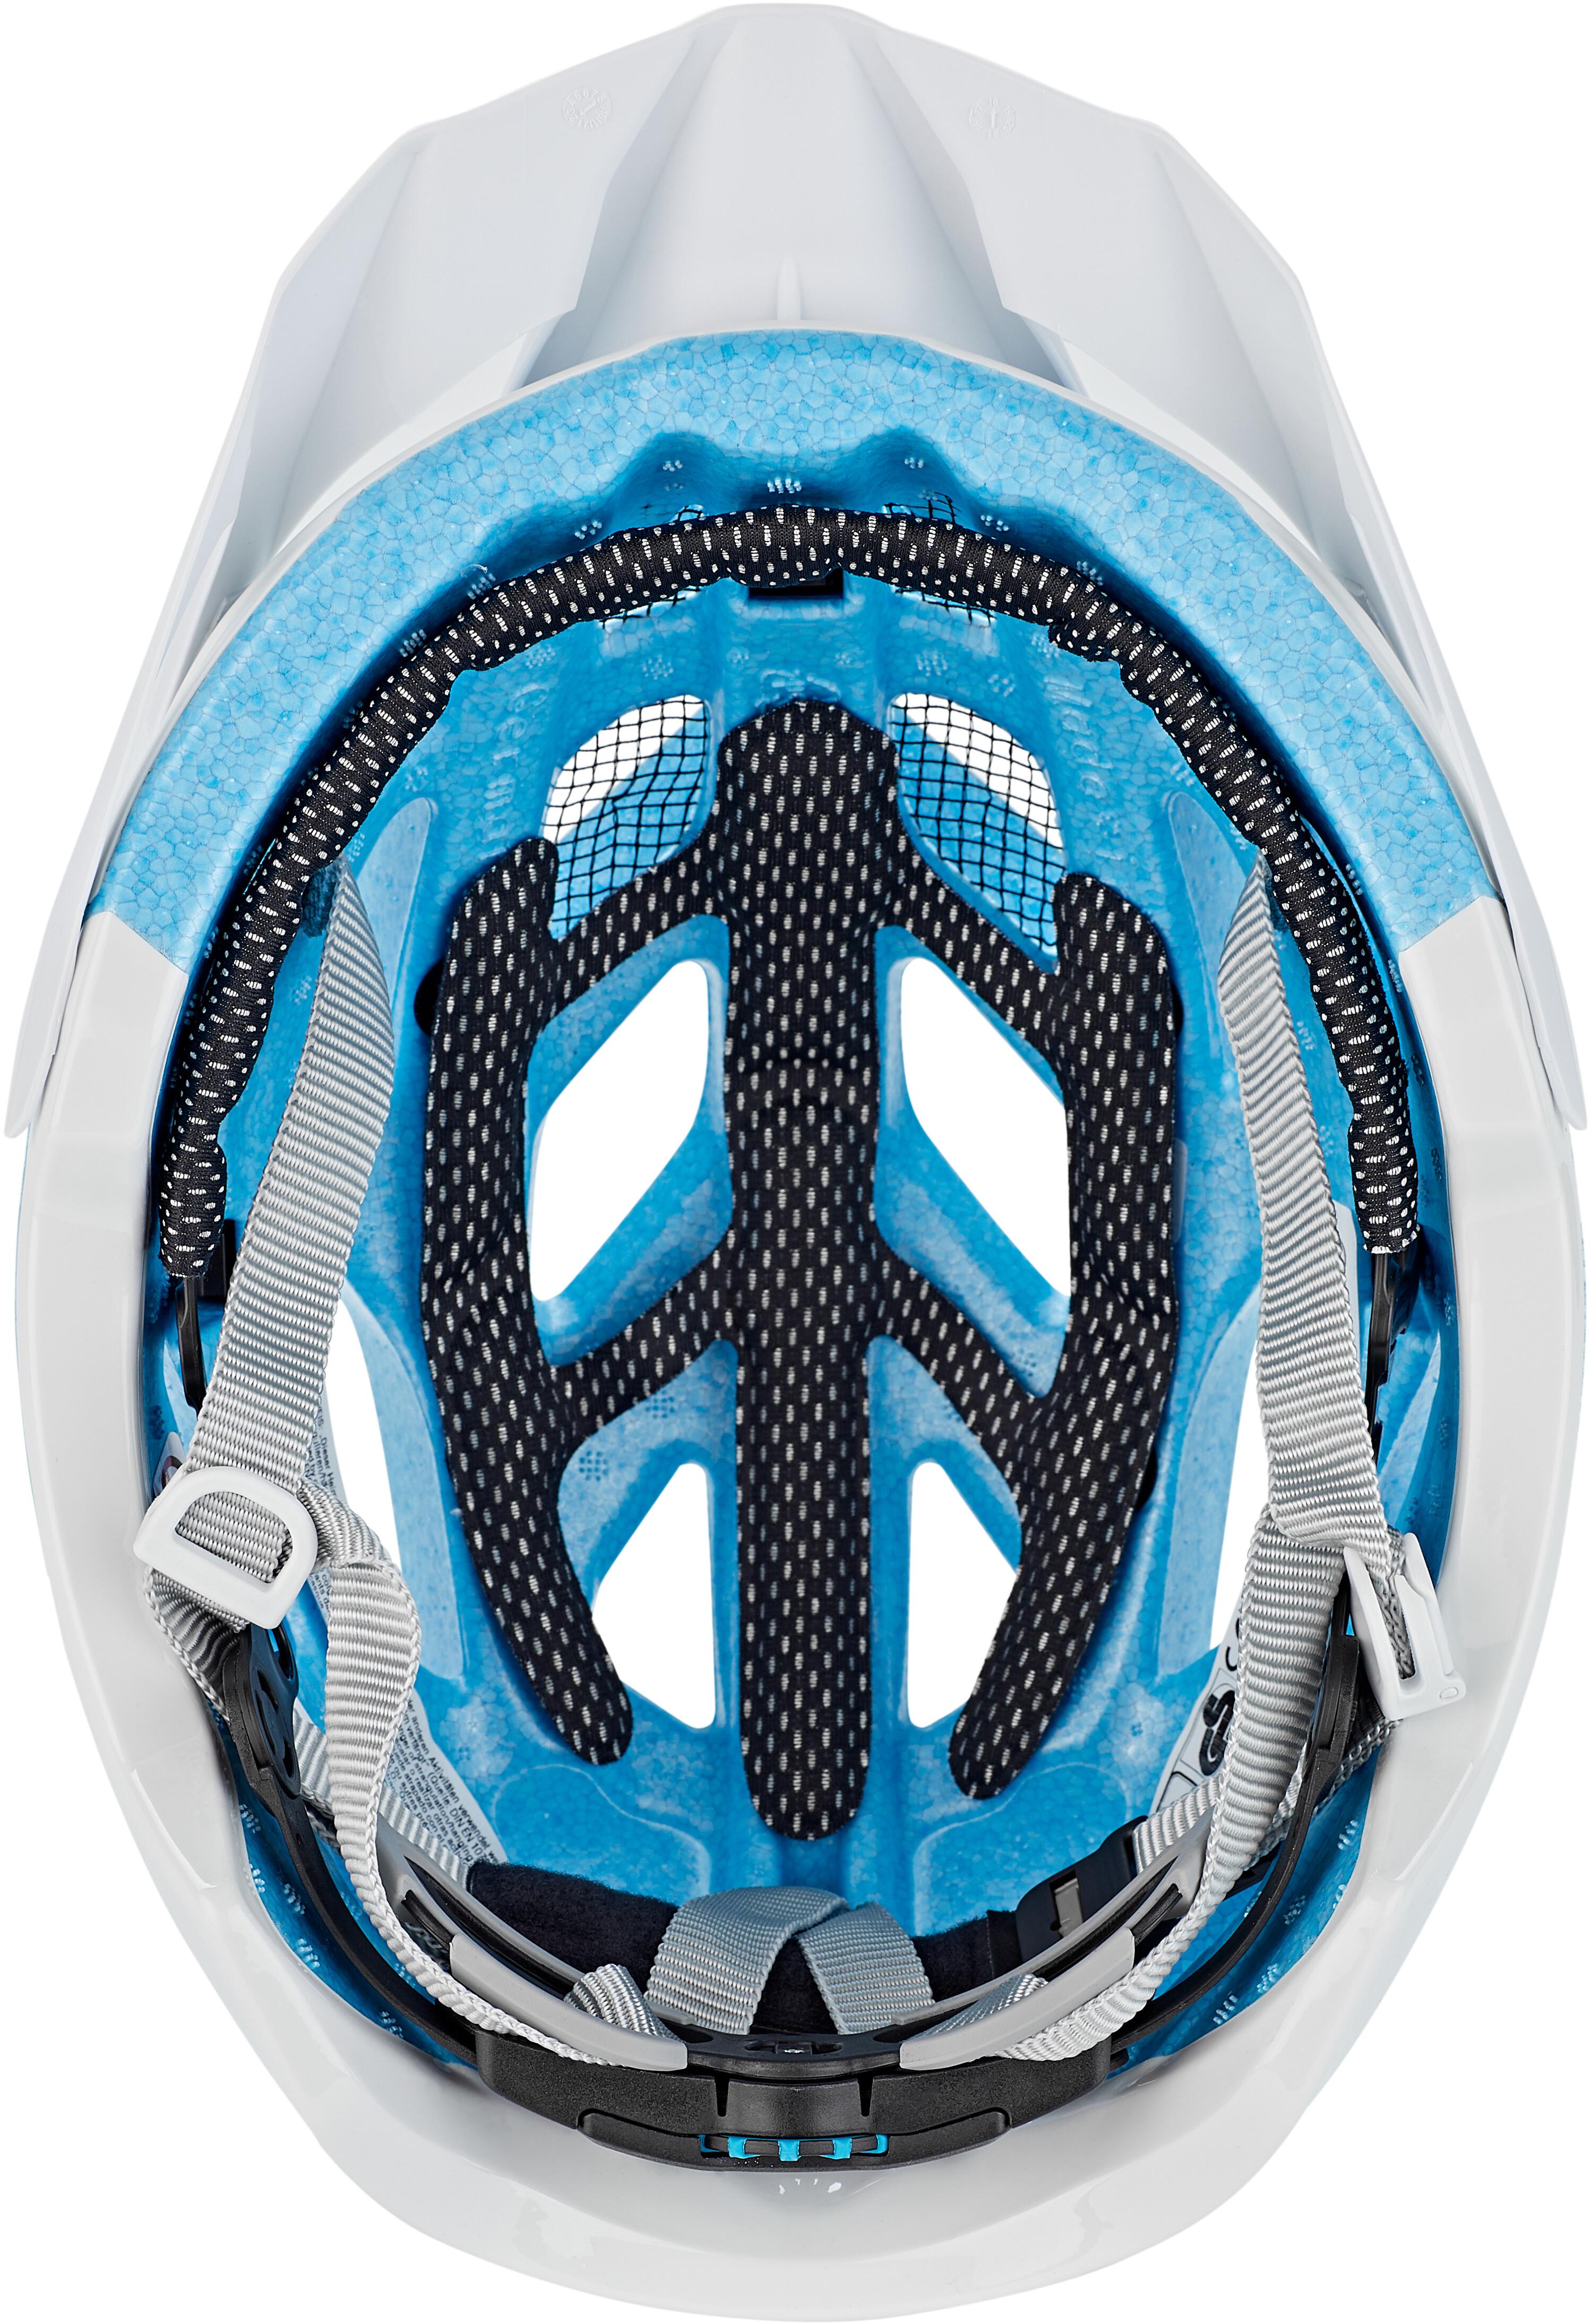 alpina mythos 3 0 l e casco white blue su bikester. Black Bedroom Furniture Sets. Home Design Ideas